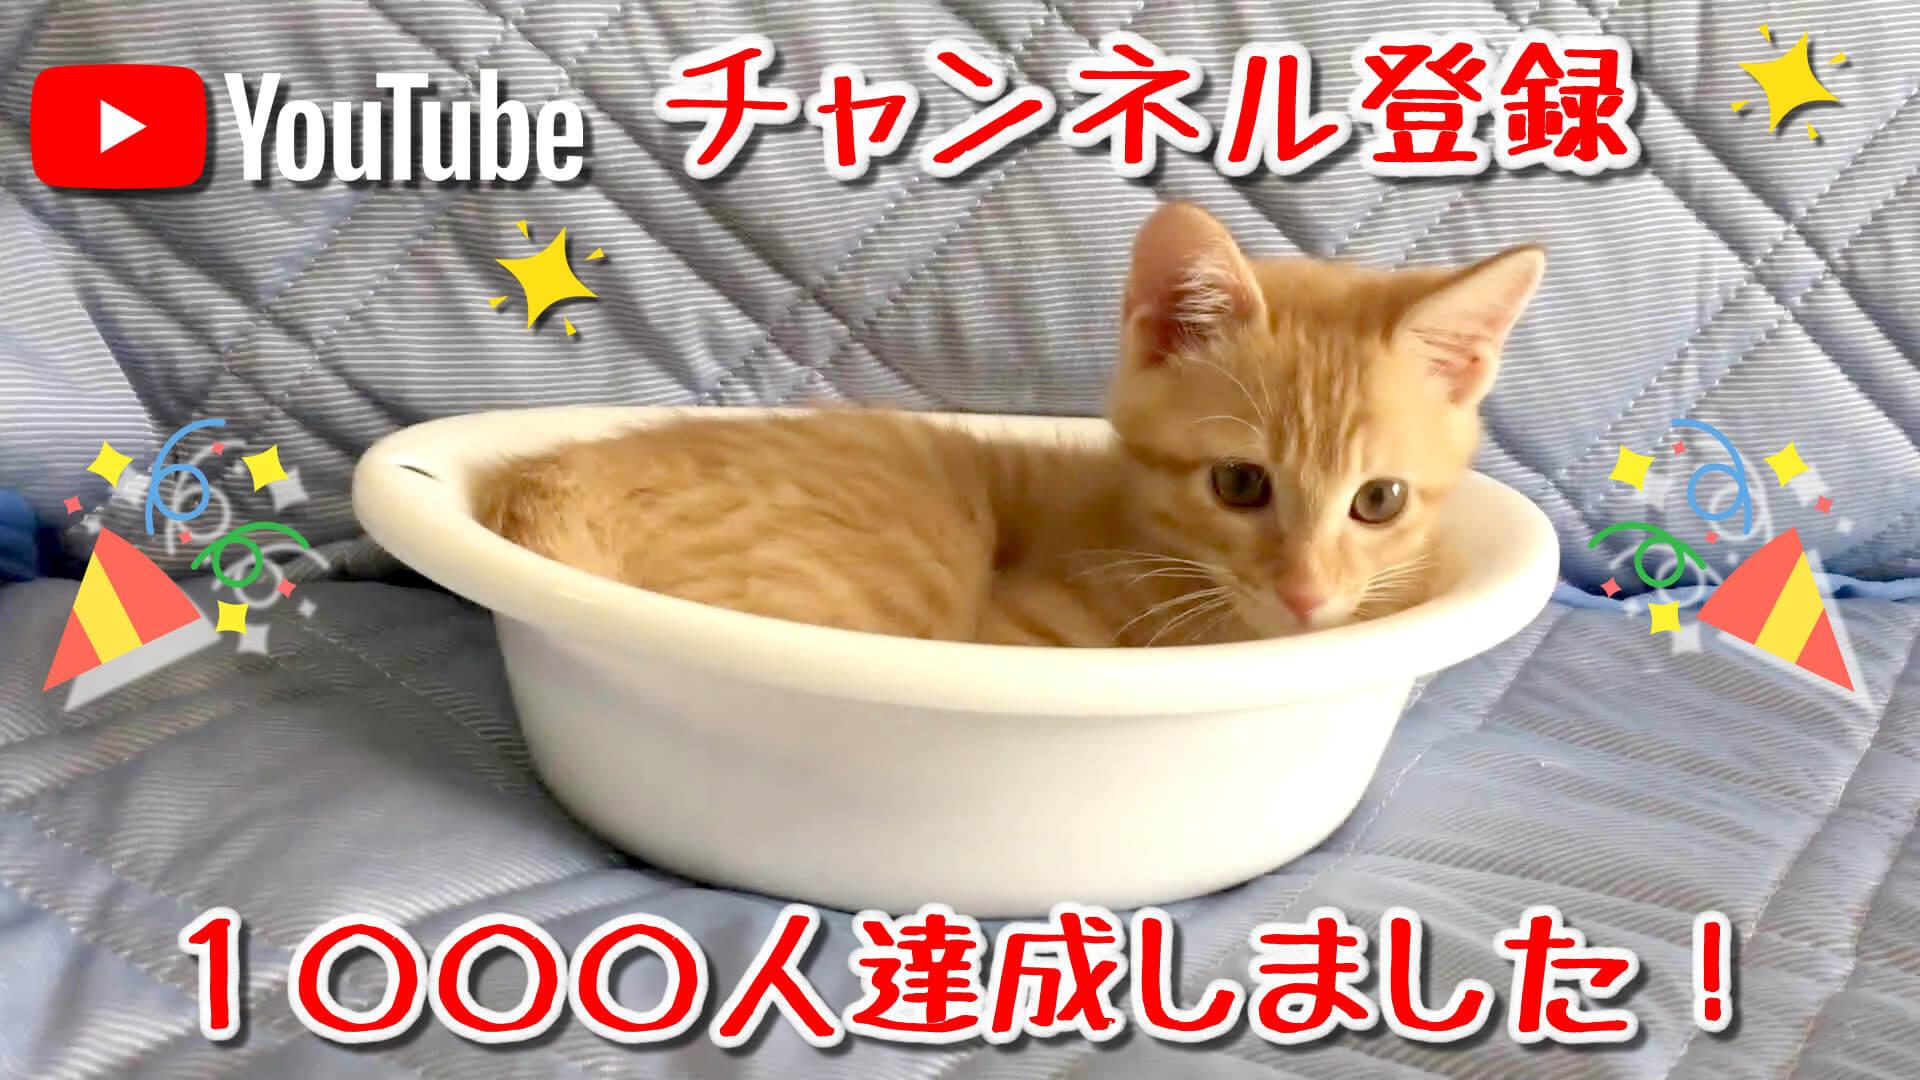 YouTube チャンネル登録者1000人達成